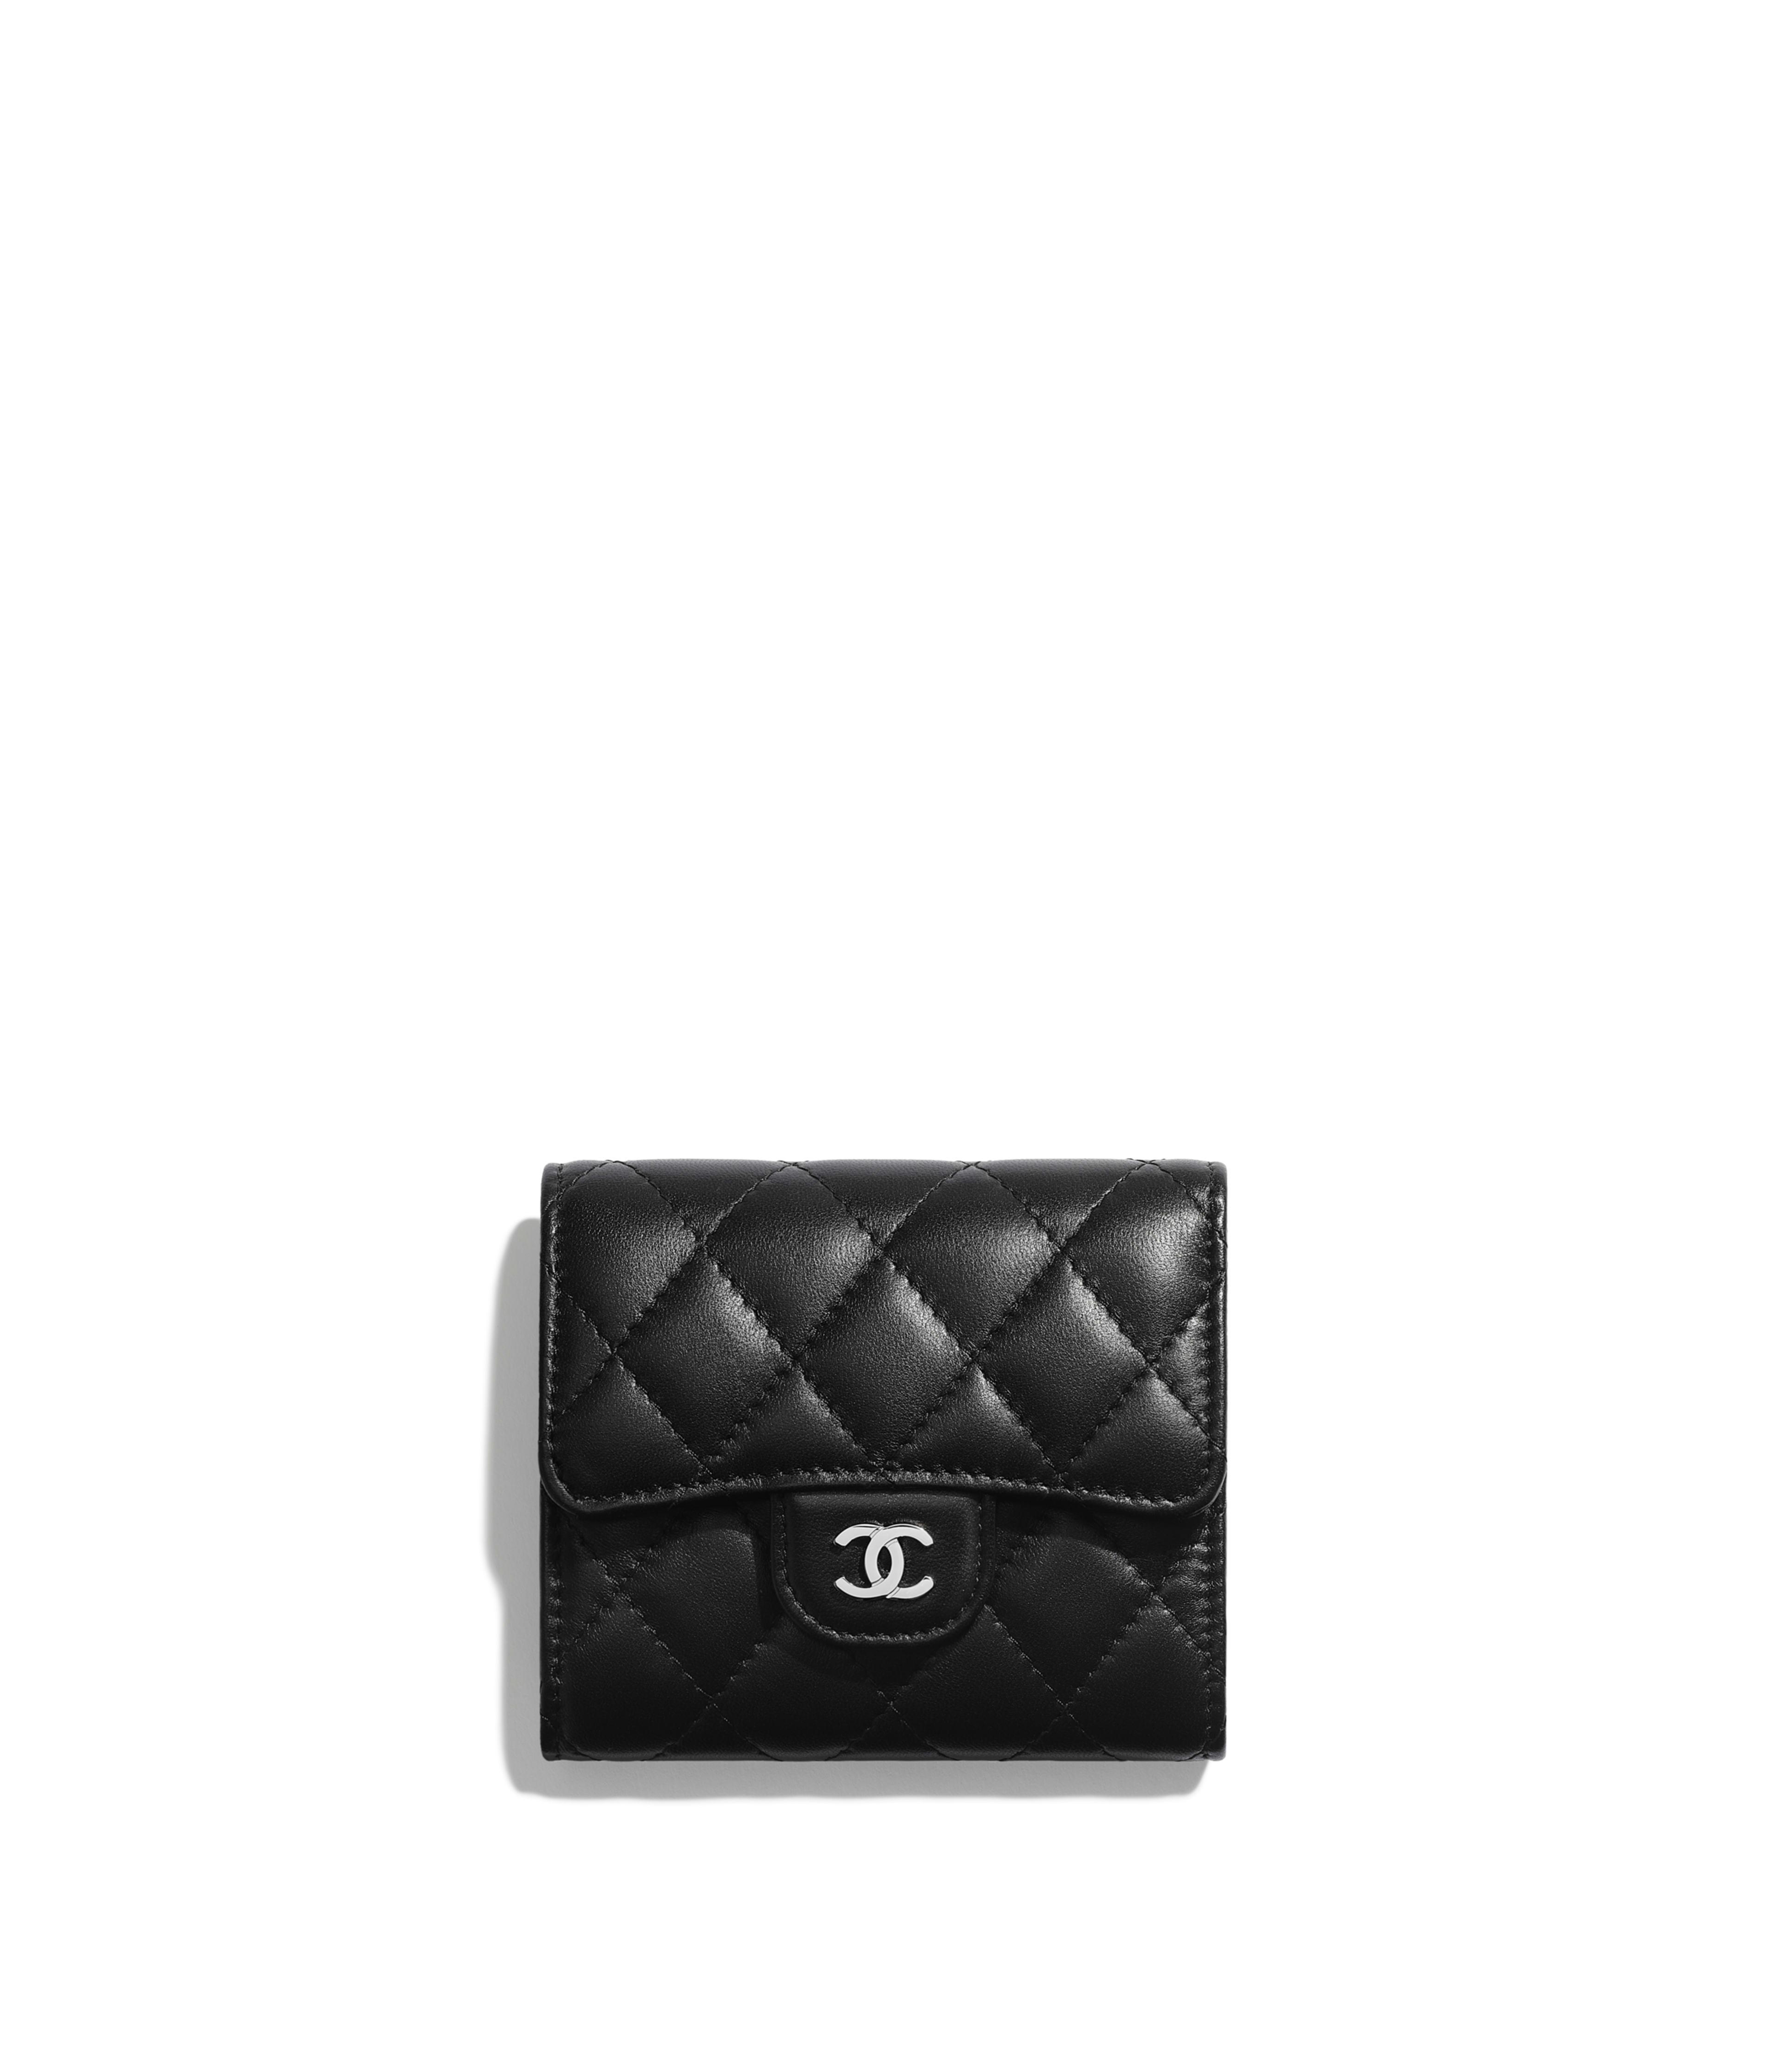 Chanel Wallets For Sale - Best Photo Wallet Justiceforkenny.Org 529fc1c2ca